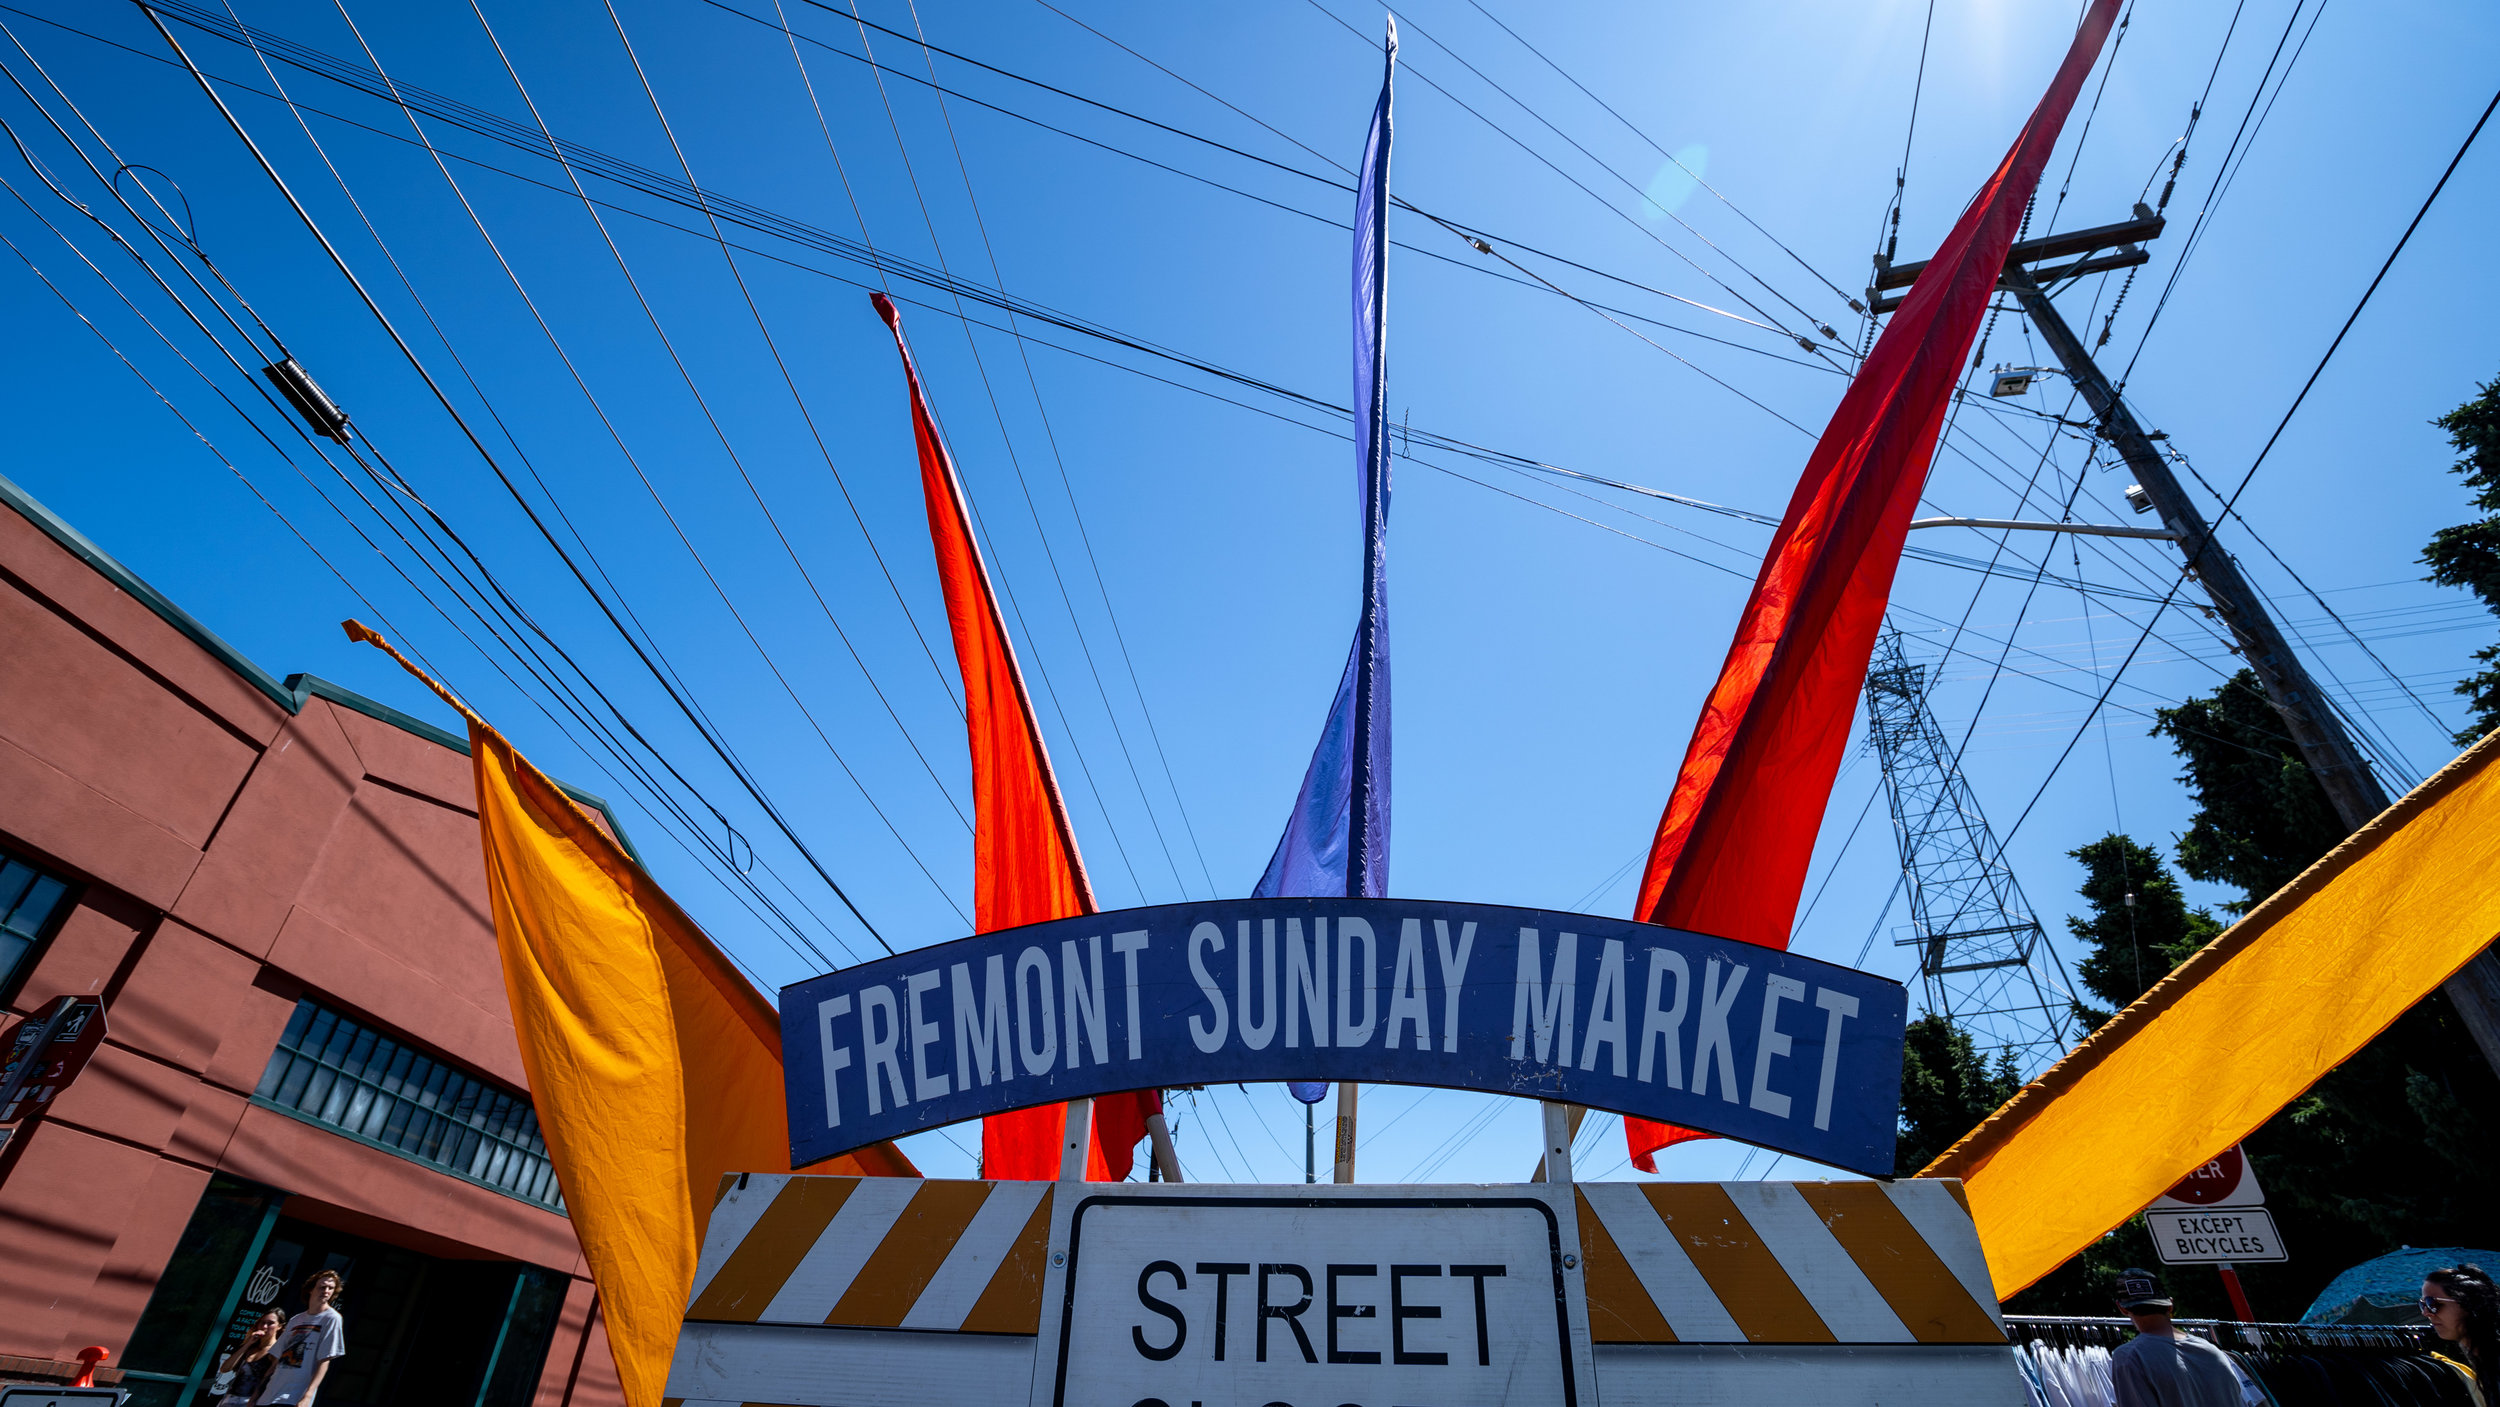 Fremont Sunday Market.jpg